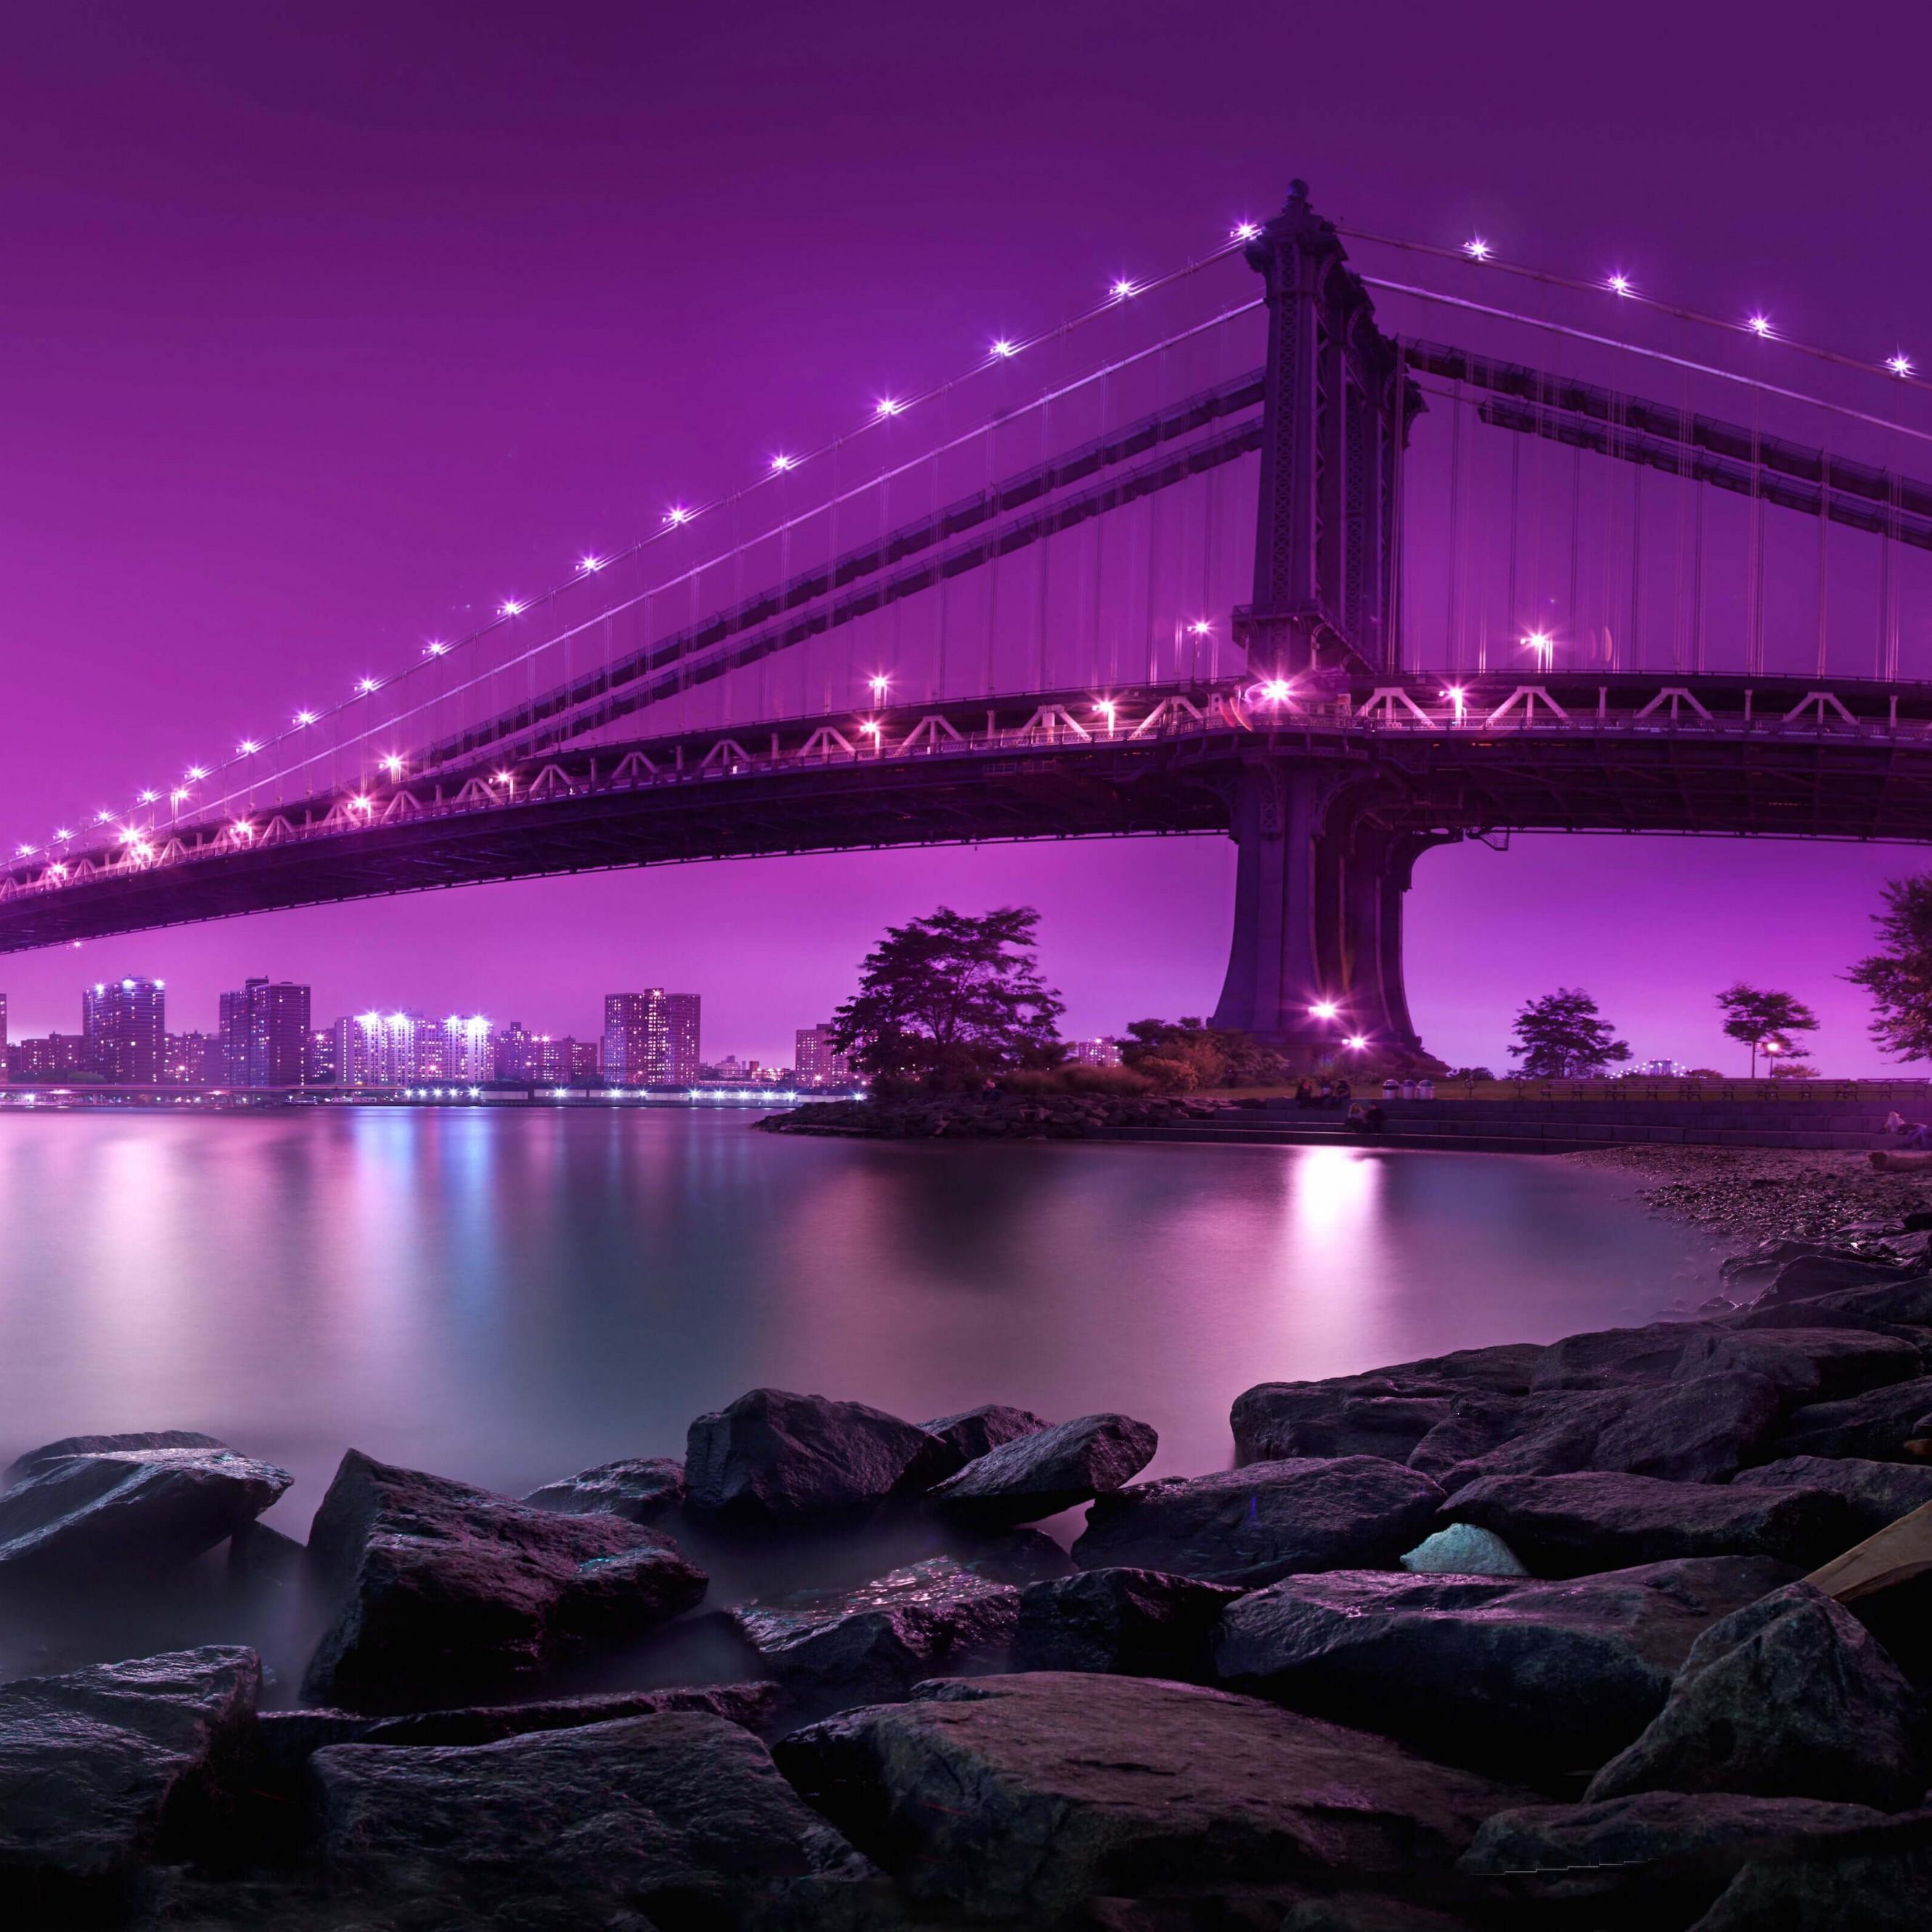 Download Brooklyn Bridge by night HD wallpaper for iPhone 6 Plus 2662x2662